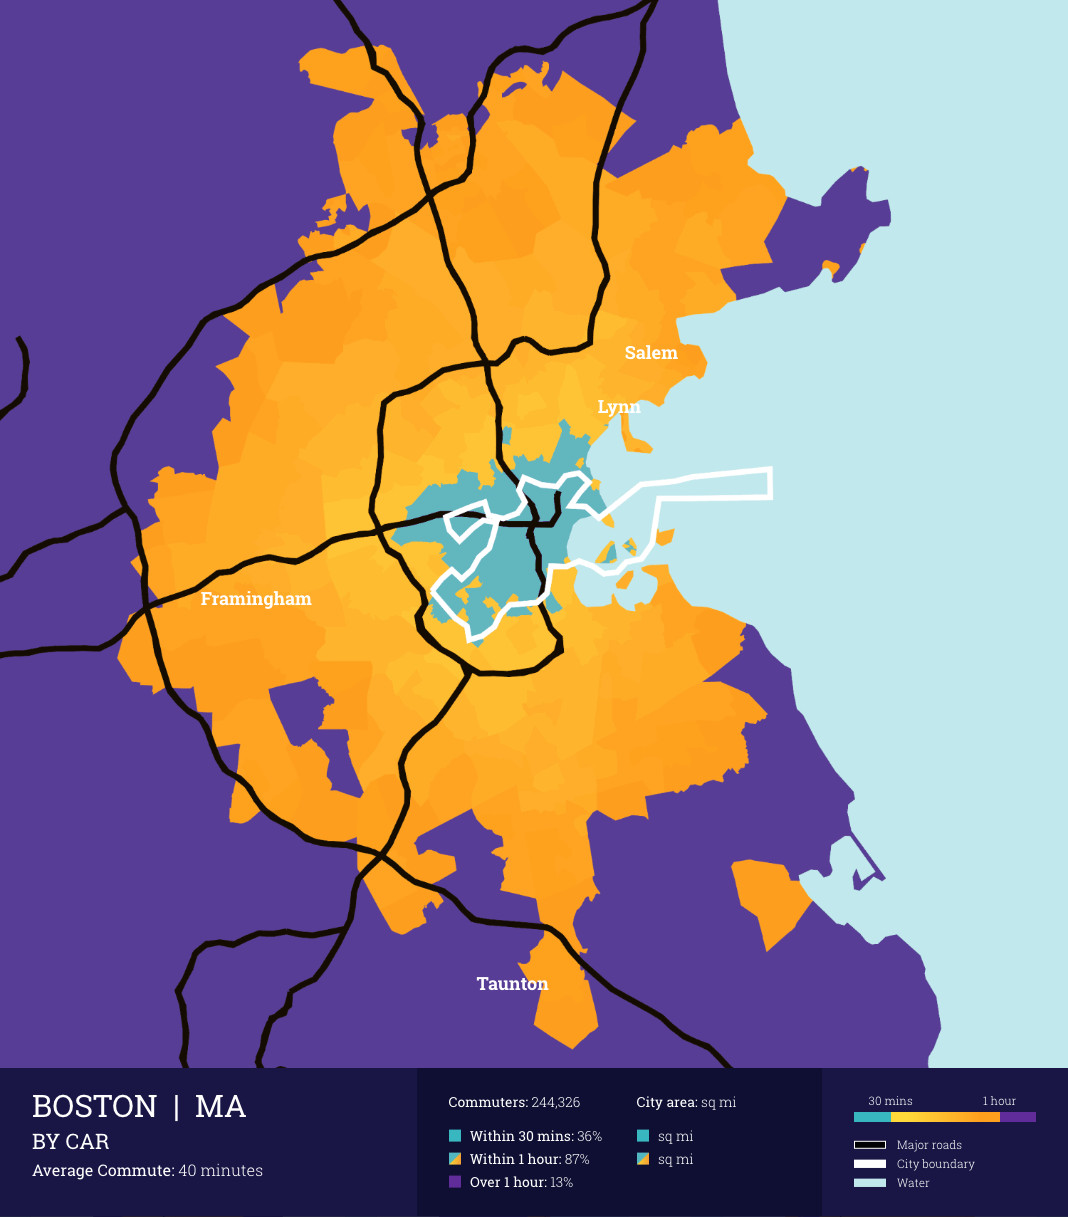 traffic map boston ma Boston Commute Times Via Car And Public Transit Among Longest In